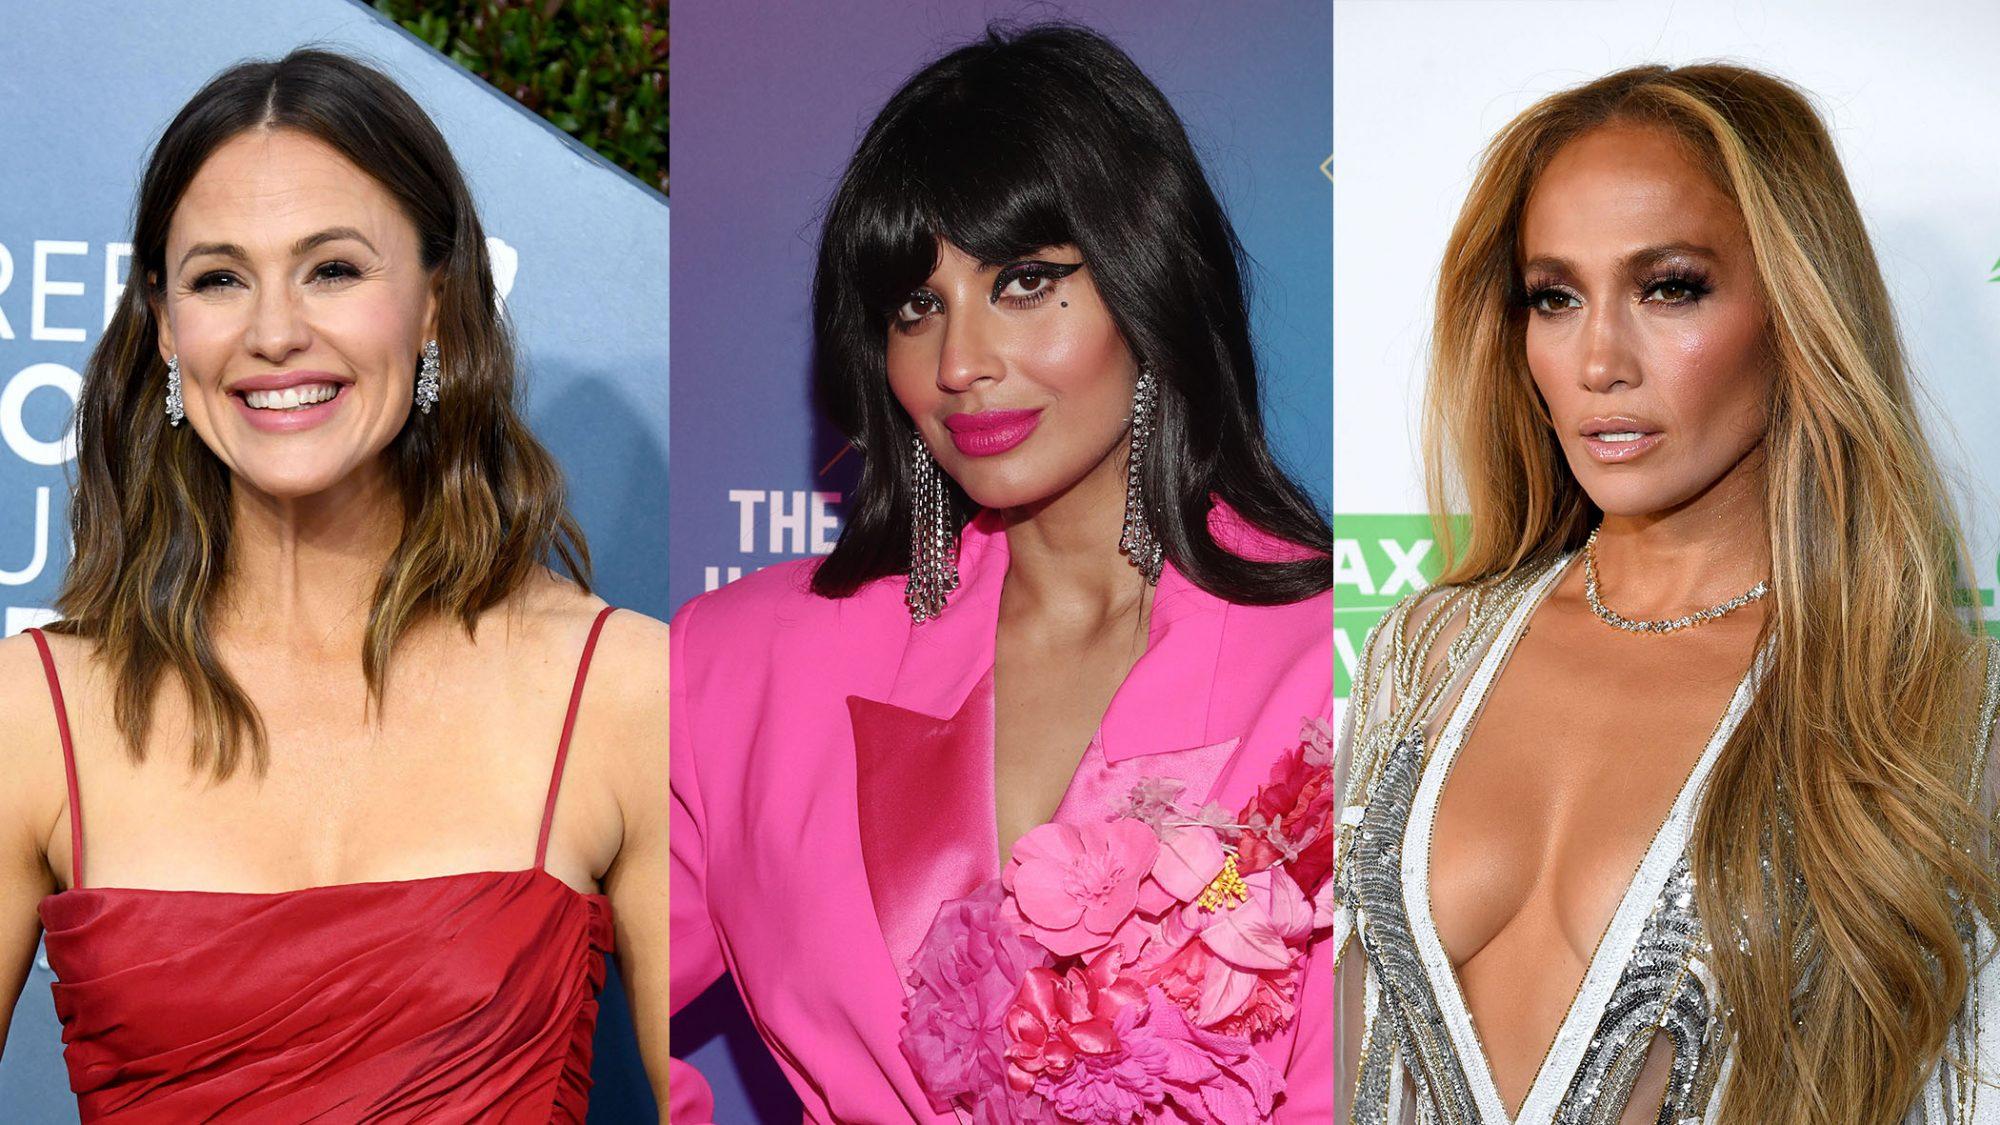 Jennifer Garner, Jameela Jamil, and Jennifer Lopez